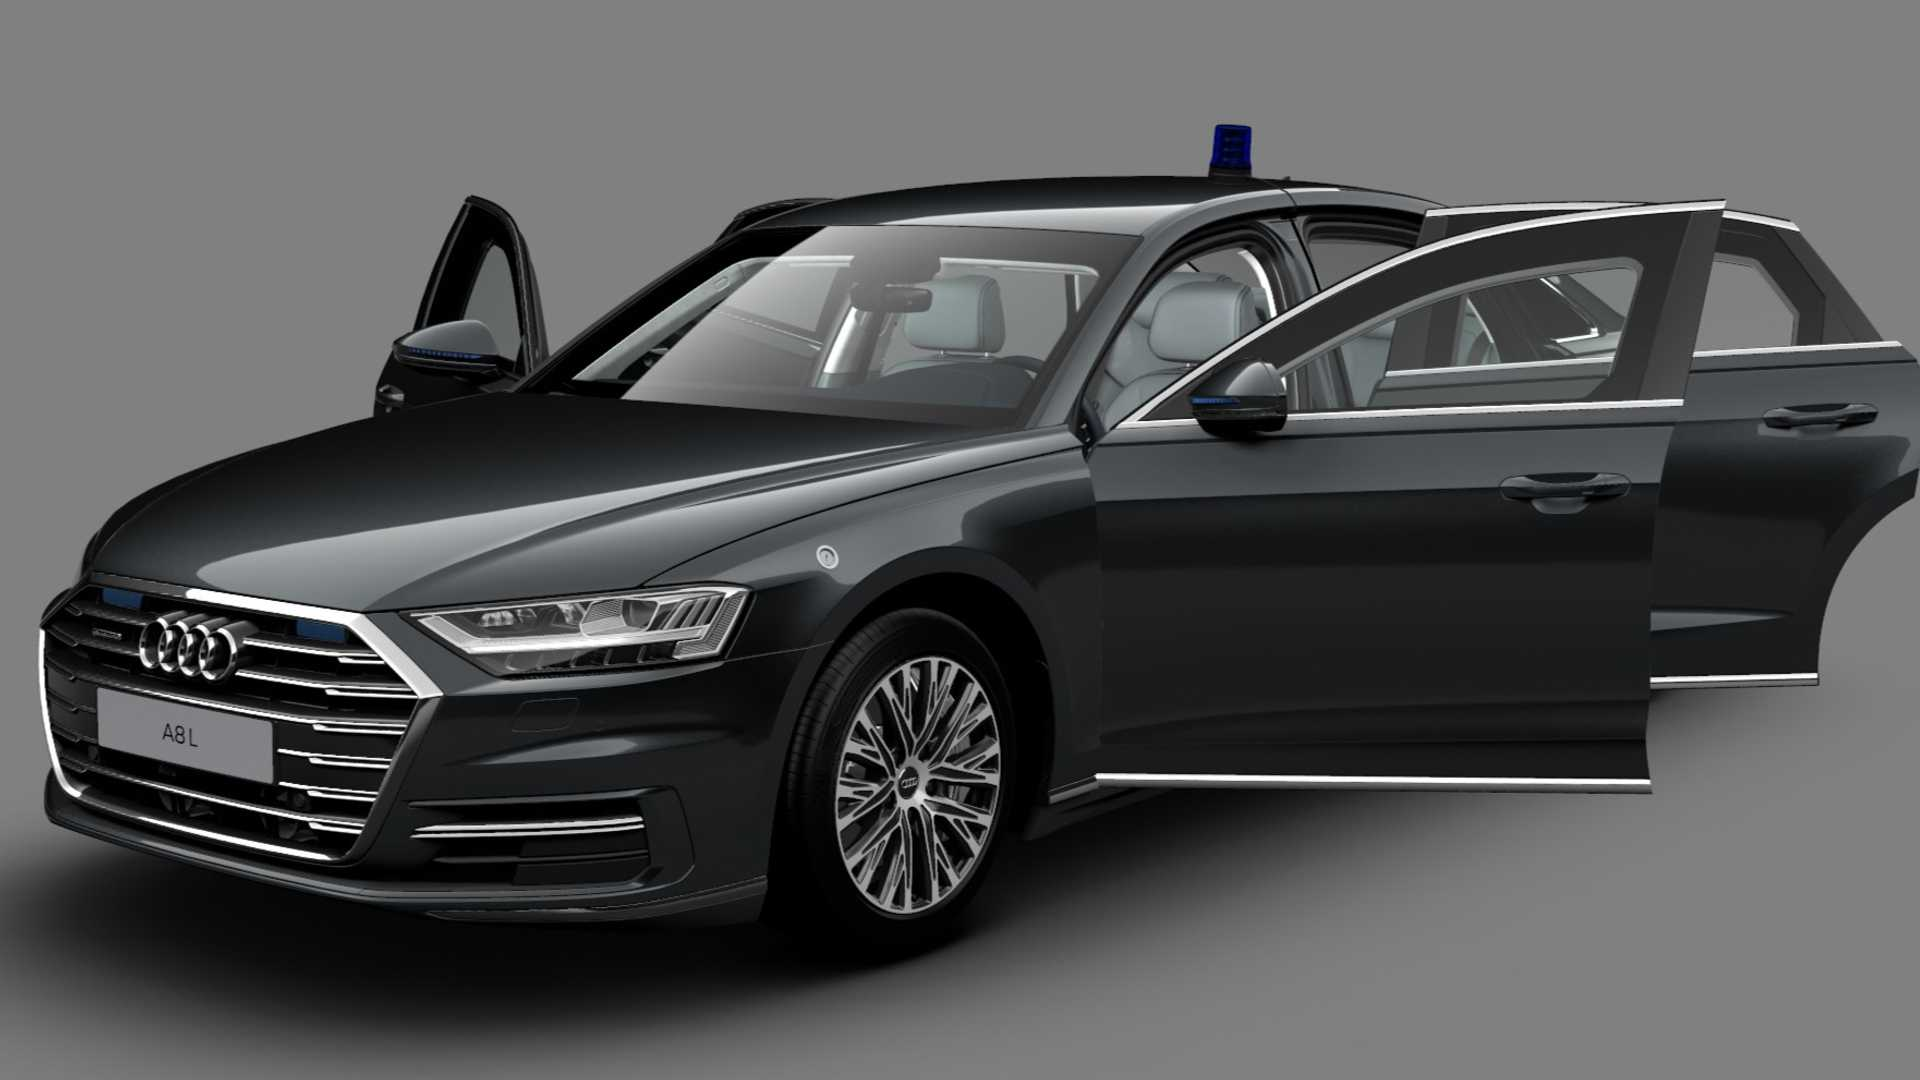 Audi A8 L Security vas štiti od požara, bombe, ali i metaka od snajpera i automatske puške